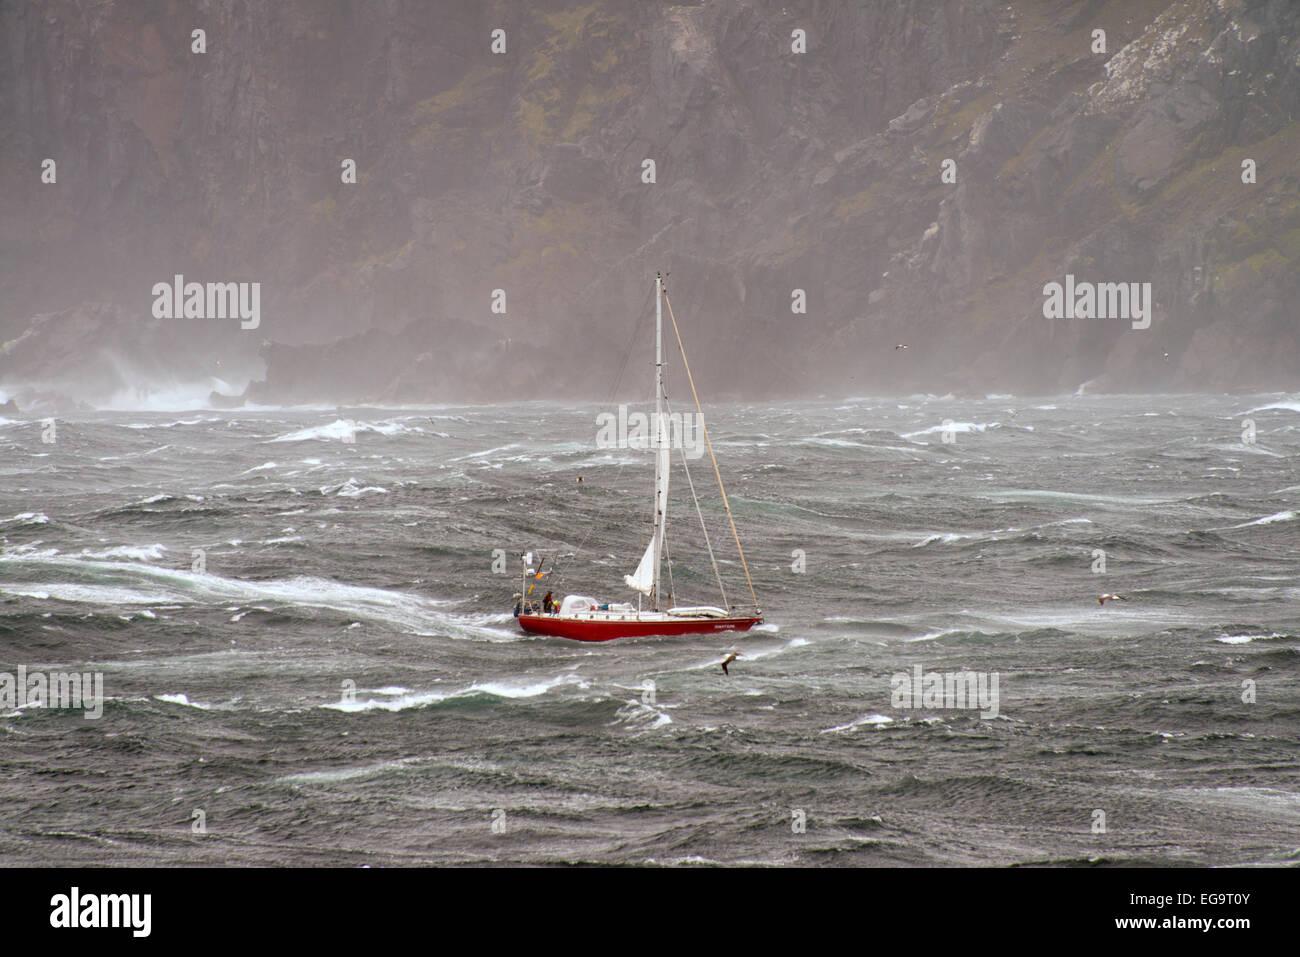 Yacht Jonathan rounding Cape Horn Tierra del Fuego - Stock Image